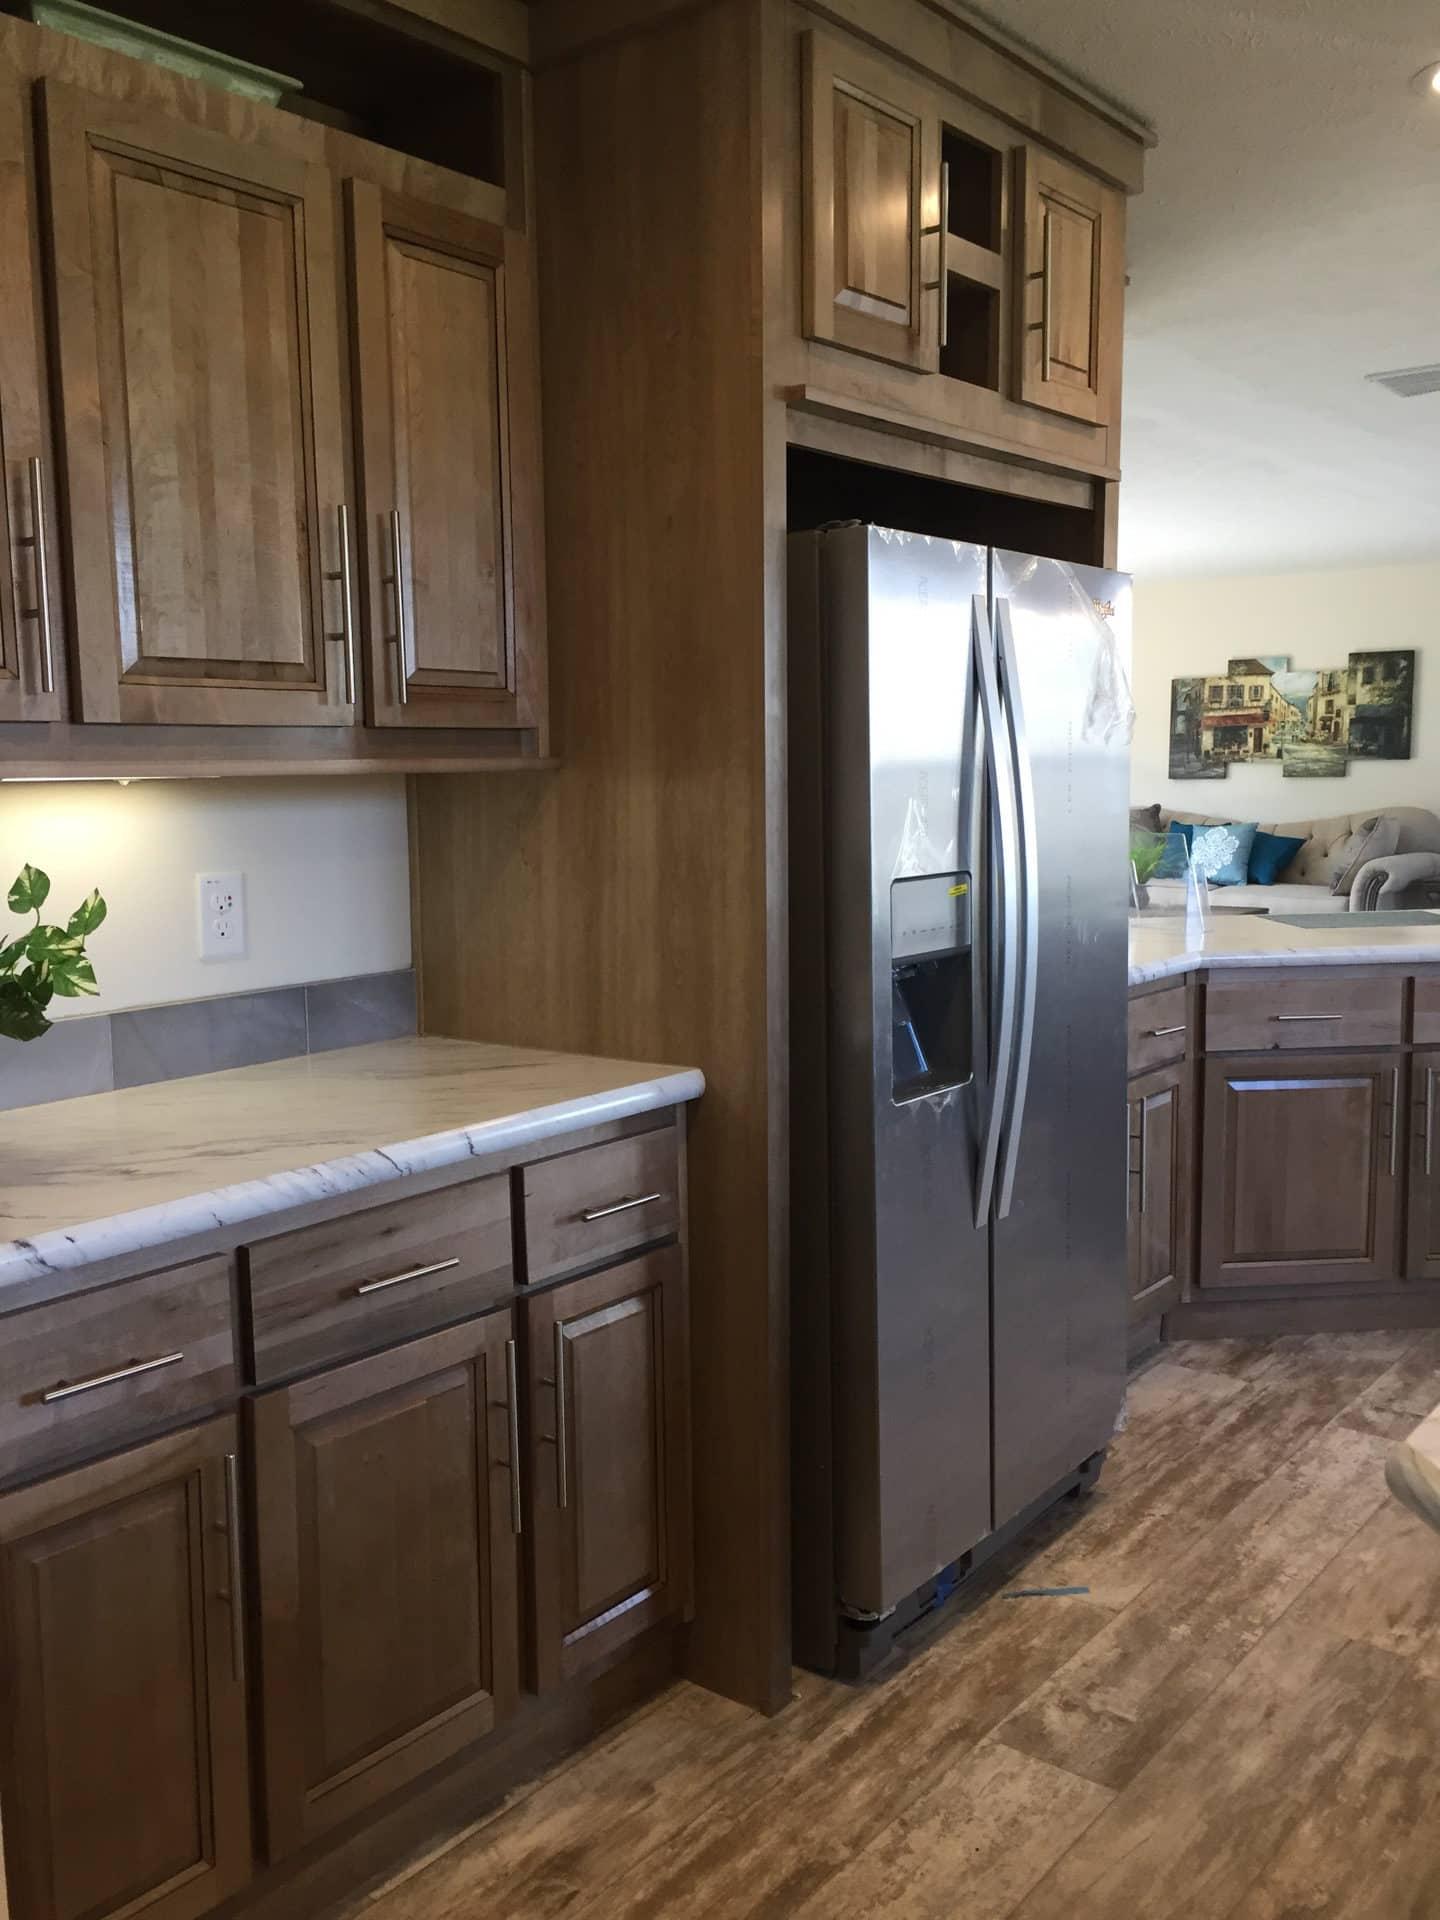 Barton stainless steel refrigerator